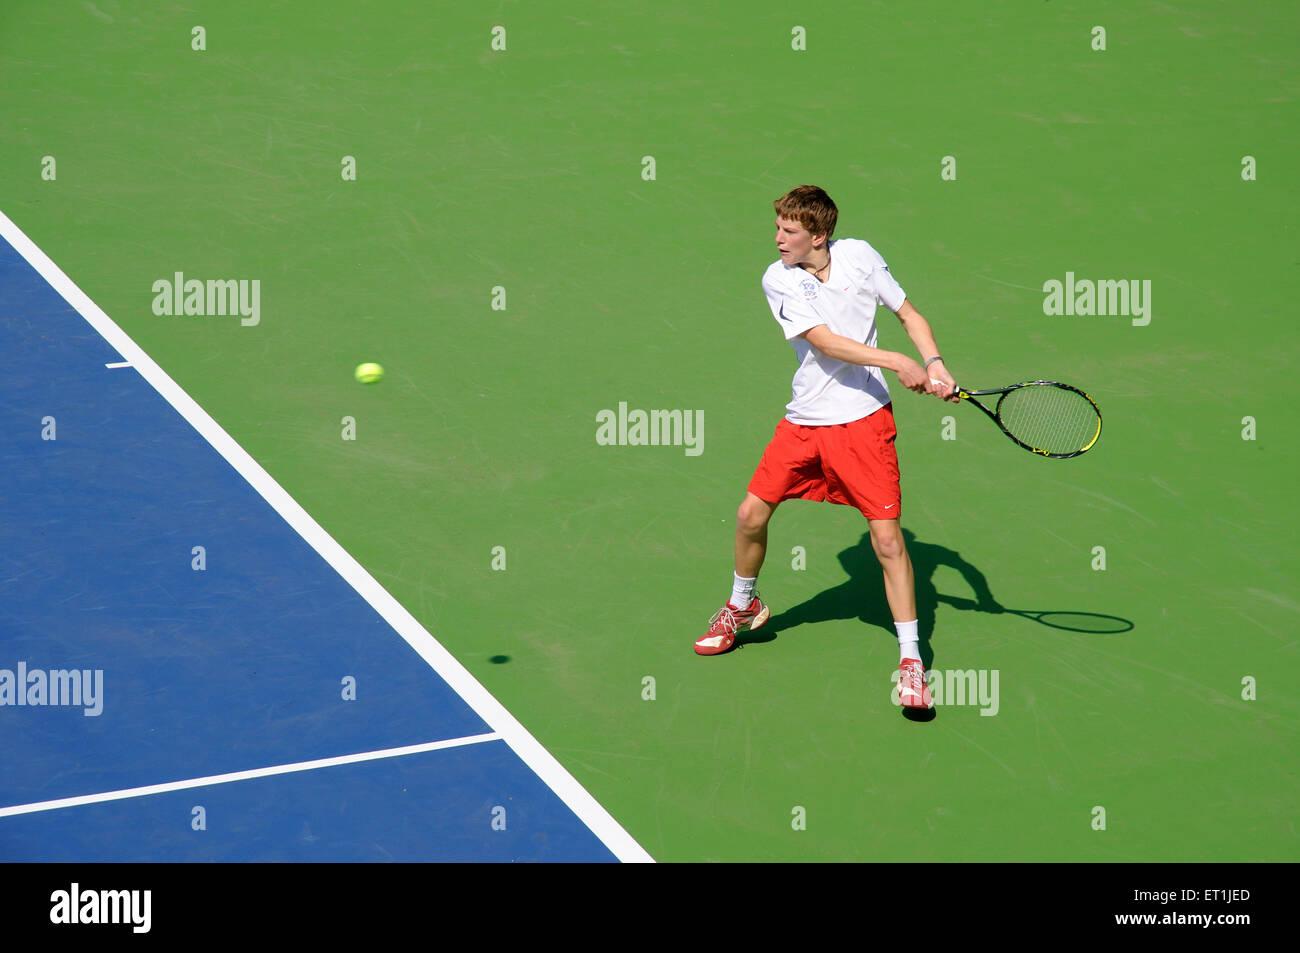 Scot clayton playing tennis ; Pune ; Maharashtra ; India 14 October 2008 NOMR - Stock Image